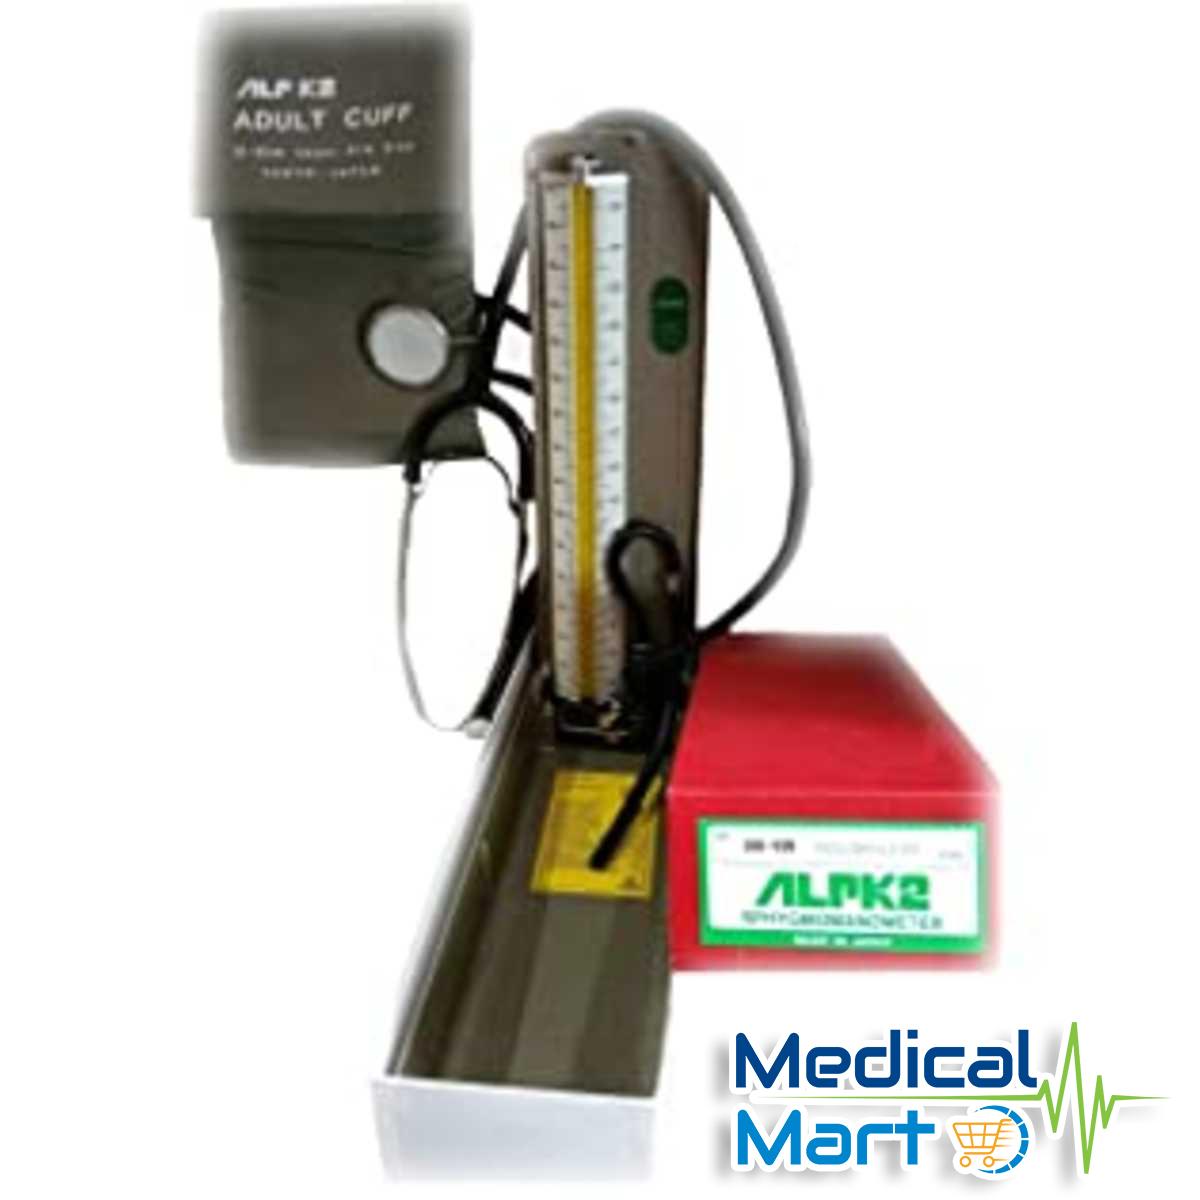 Mercurial Sphygmomanometer With Stethoscope